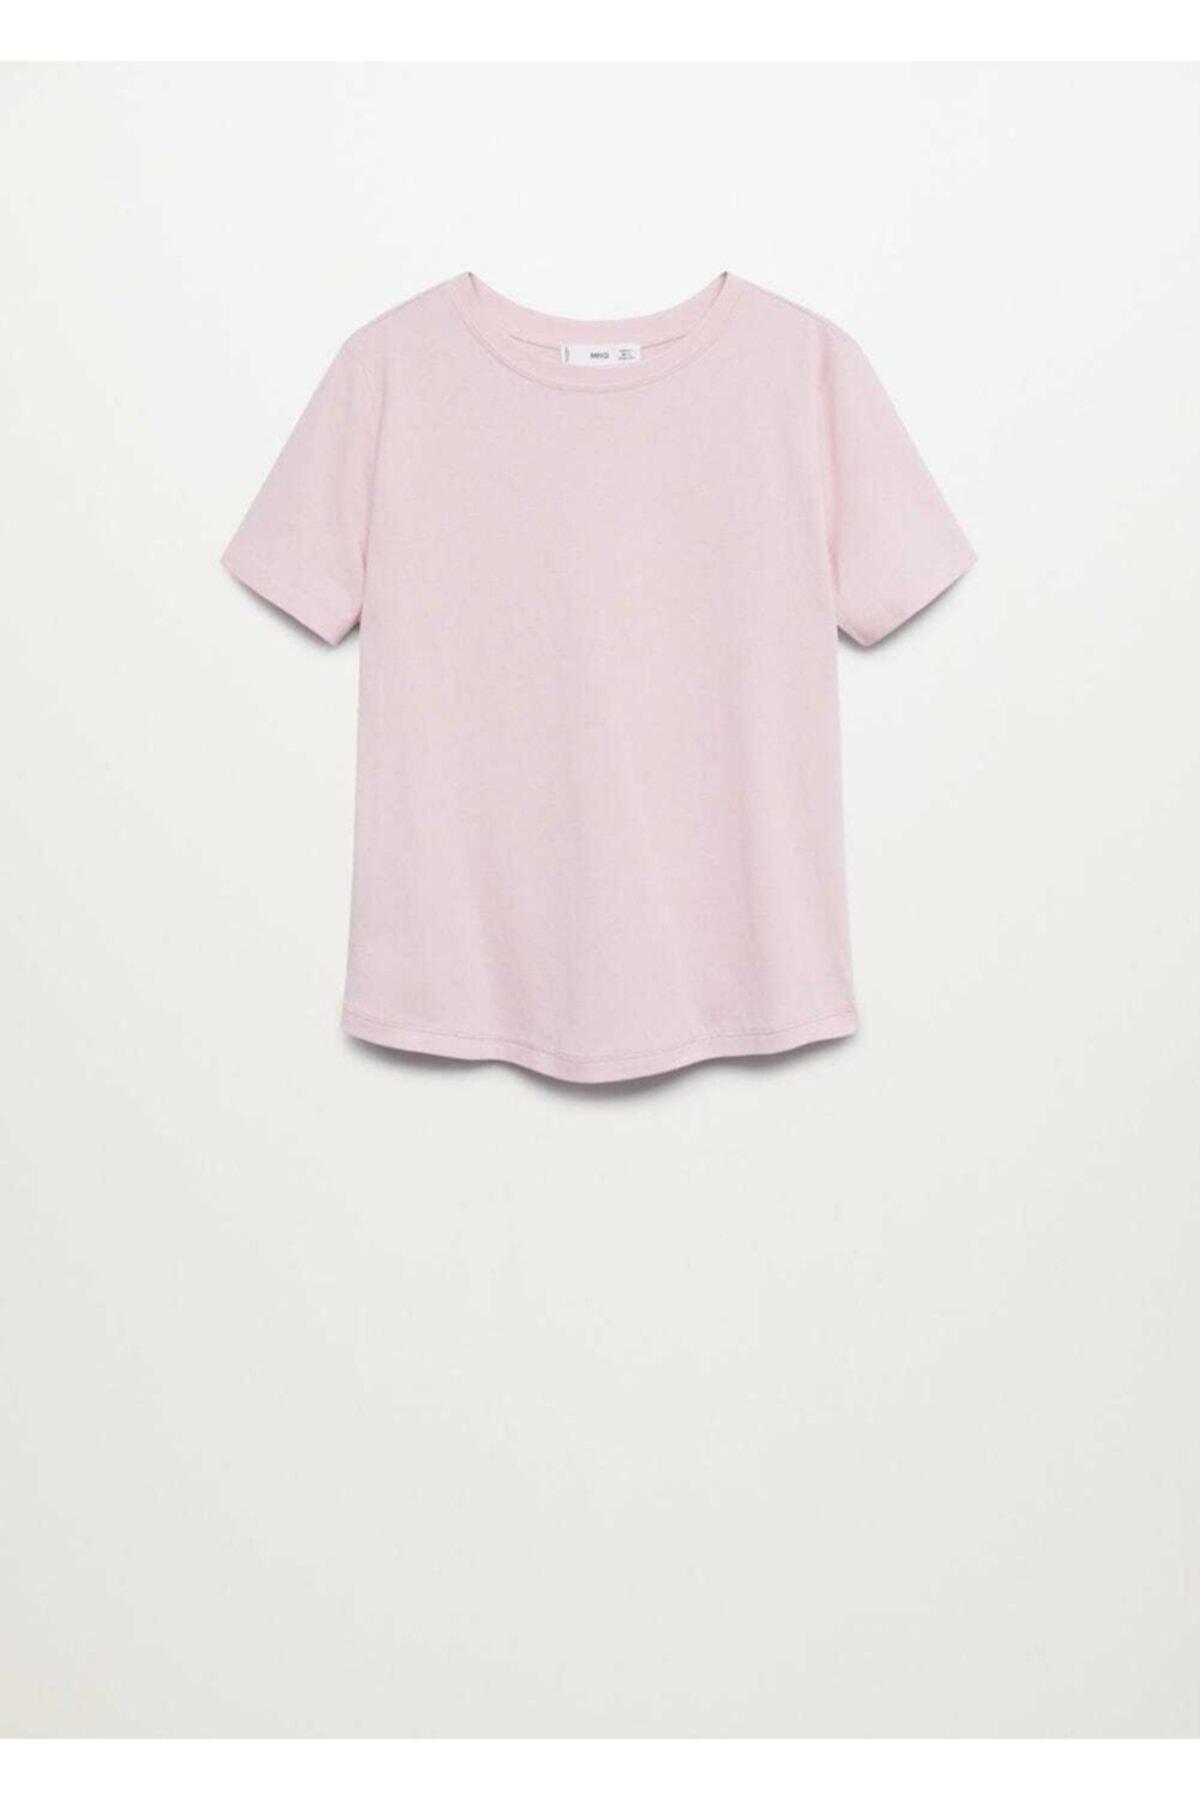 Mango Kadın Pembe Organik Pamuklu Basic Tişört